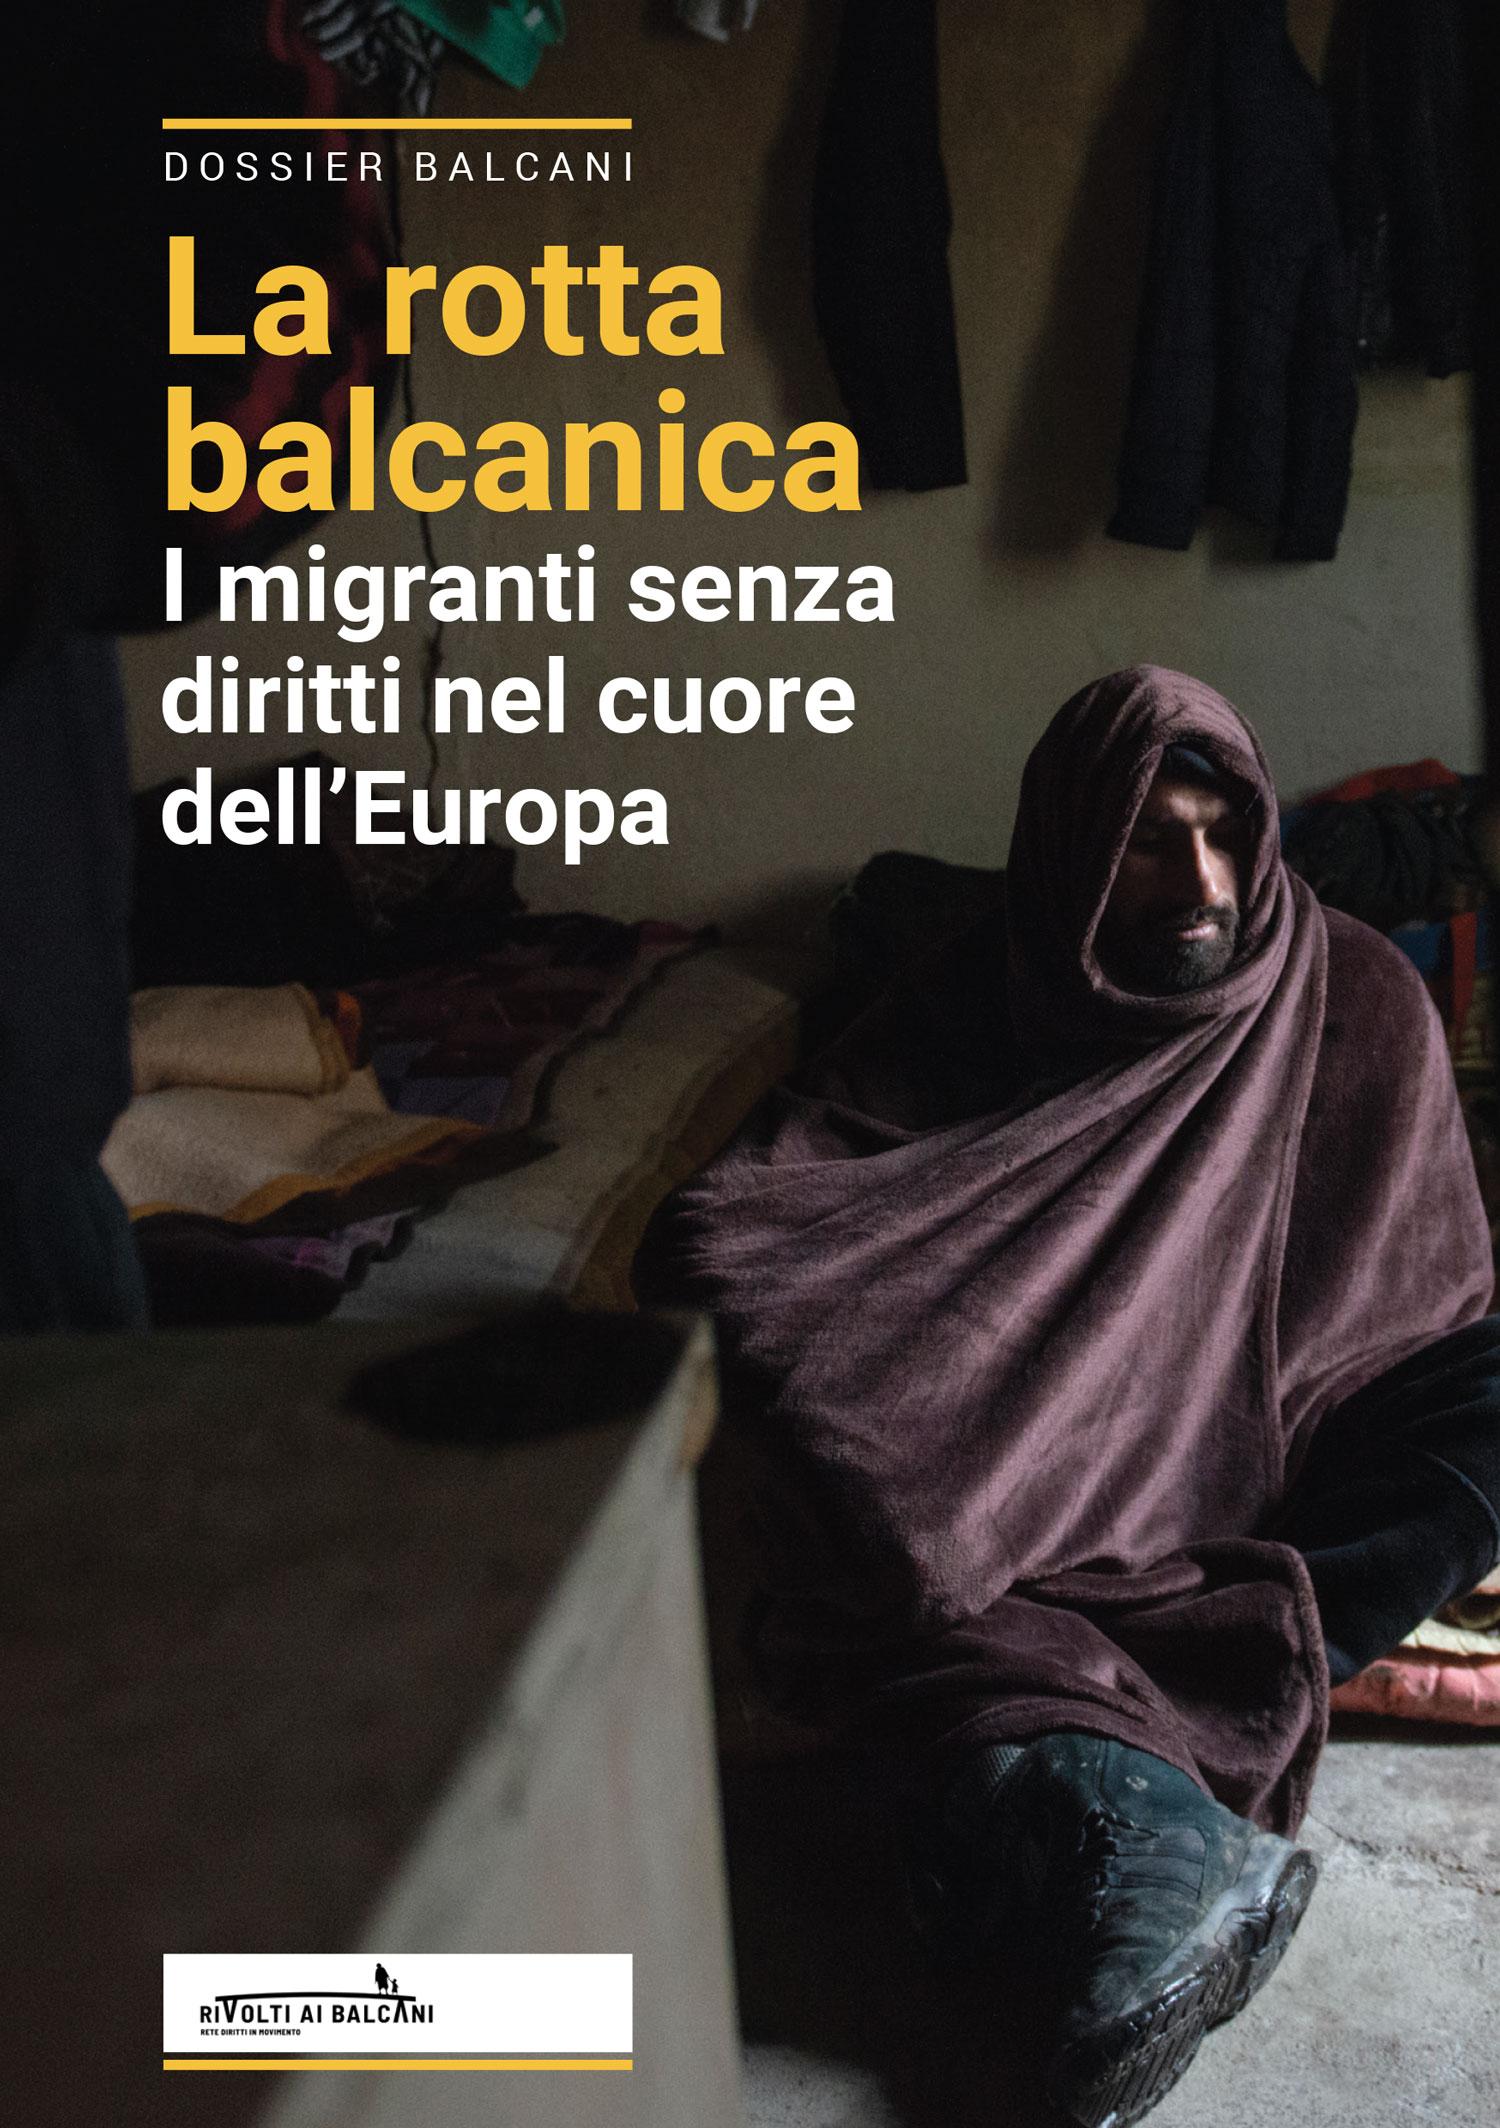 Refugee Rights Europe Pushbacks Balkan Route Pushed La Rotta Balcanica Rivolti Al Balcani